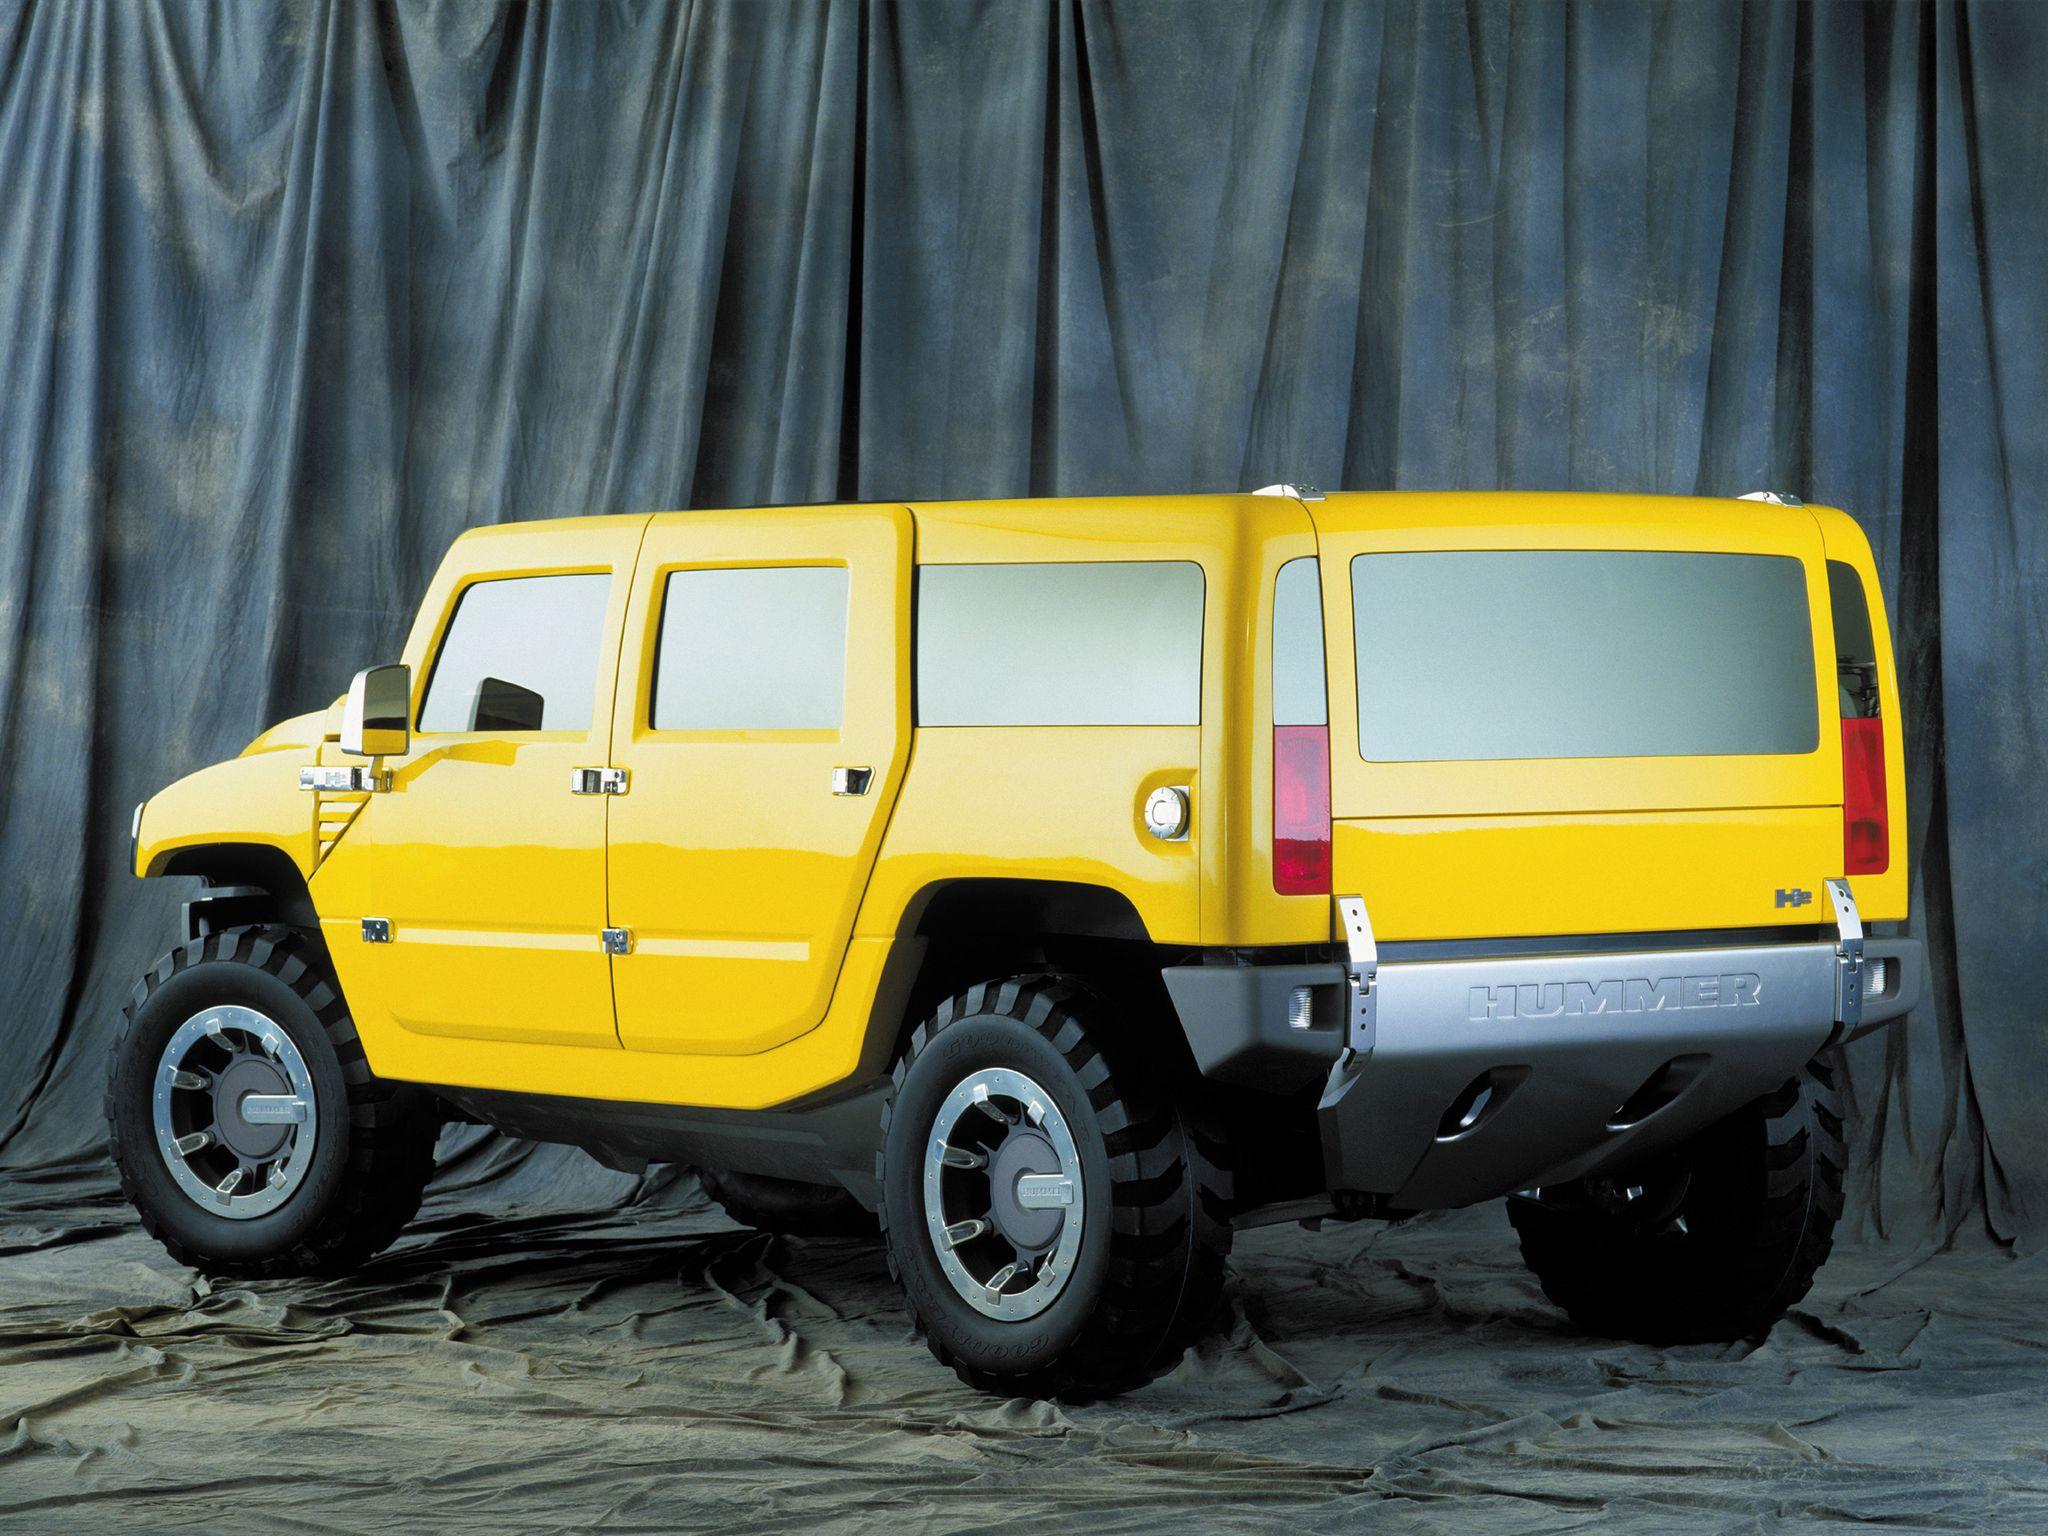 Hummer H2 SUV Concept 2000 Cars Detroit 2000